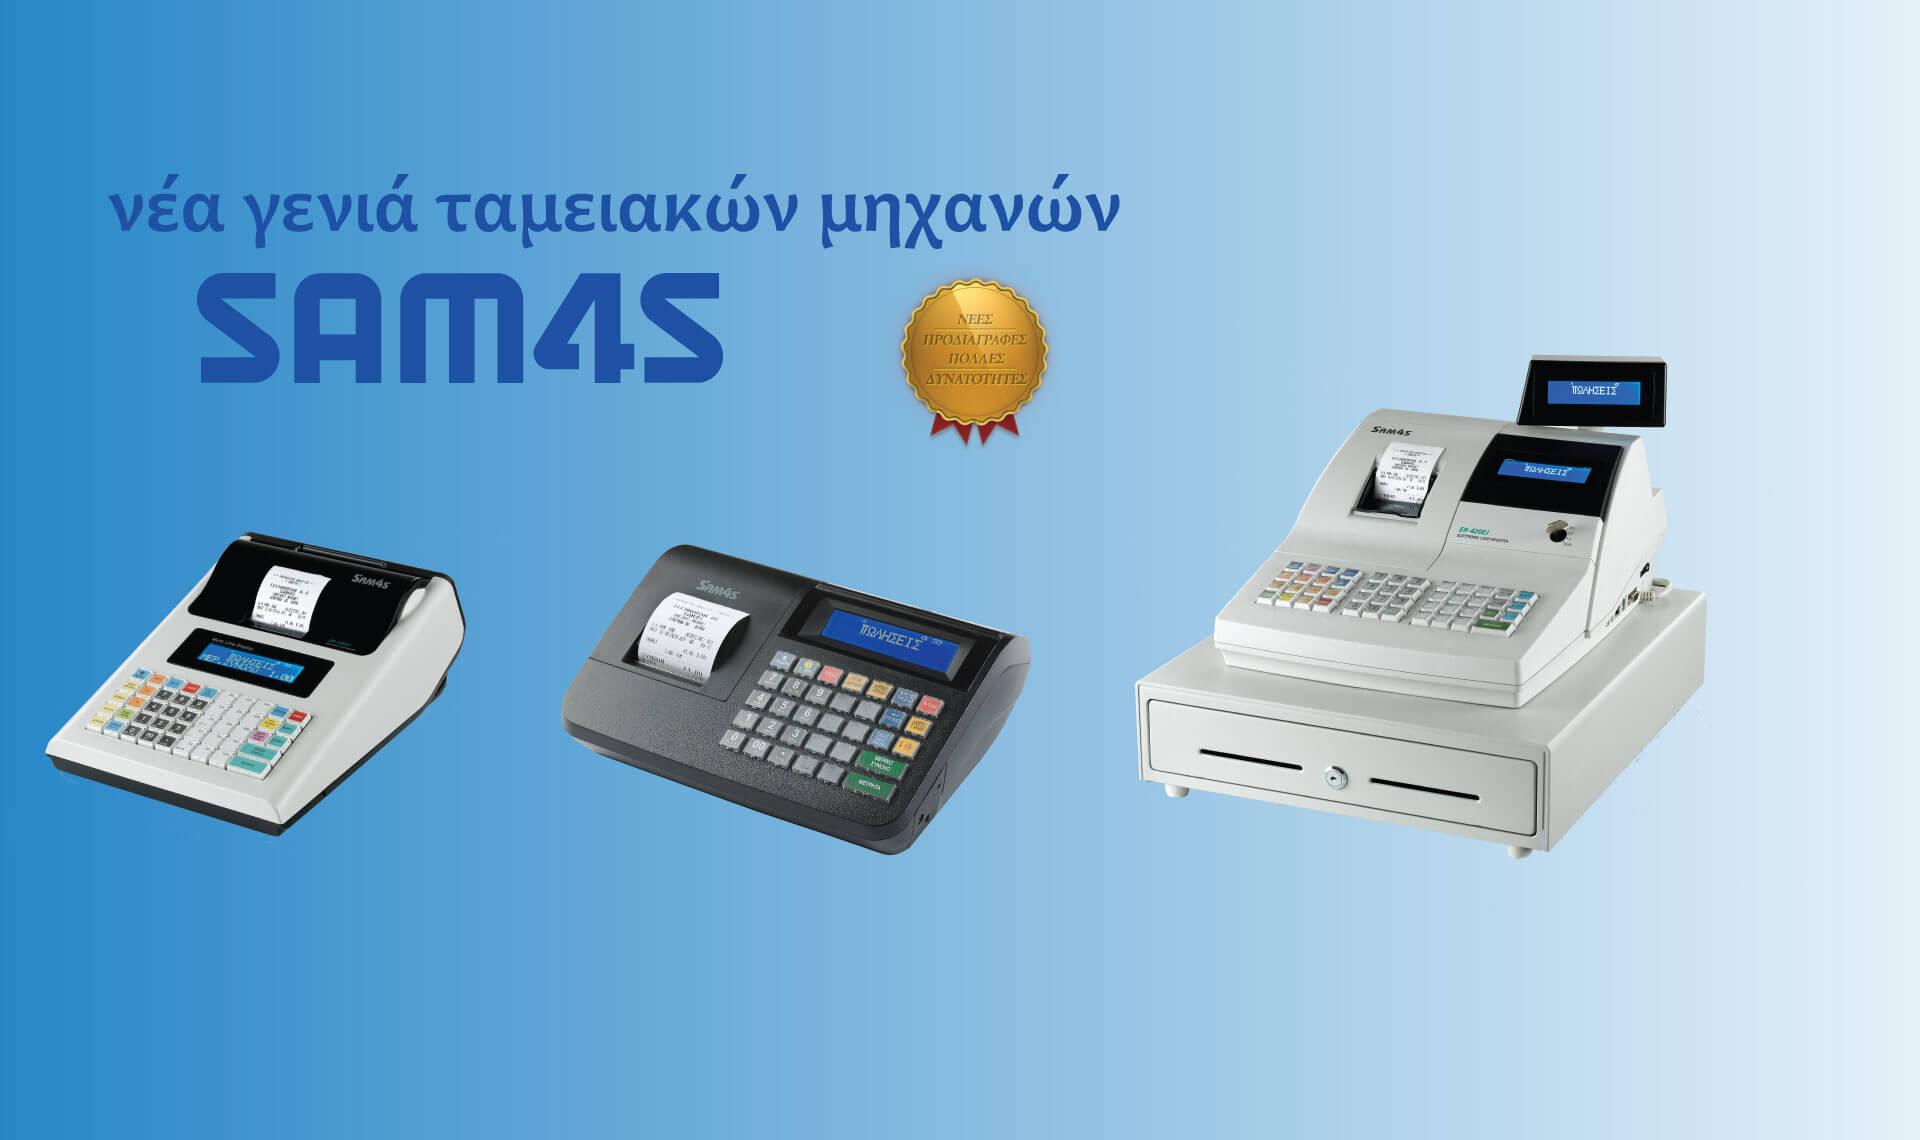 SAM4S ταμειακές μηχανές